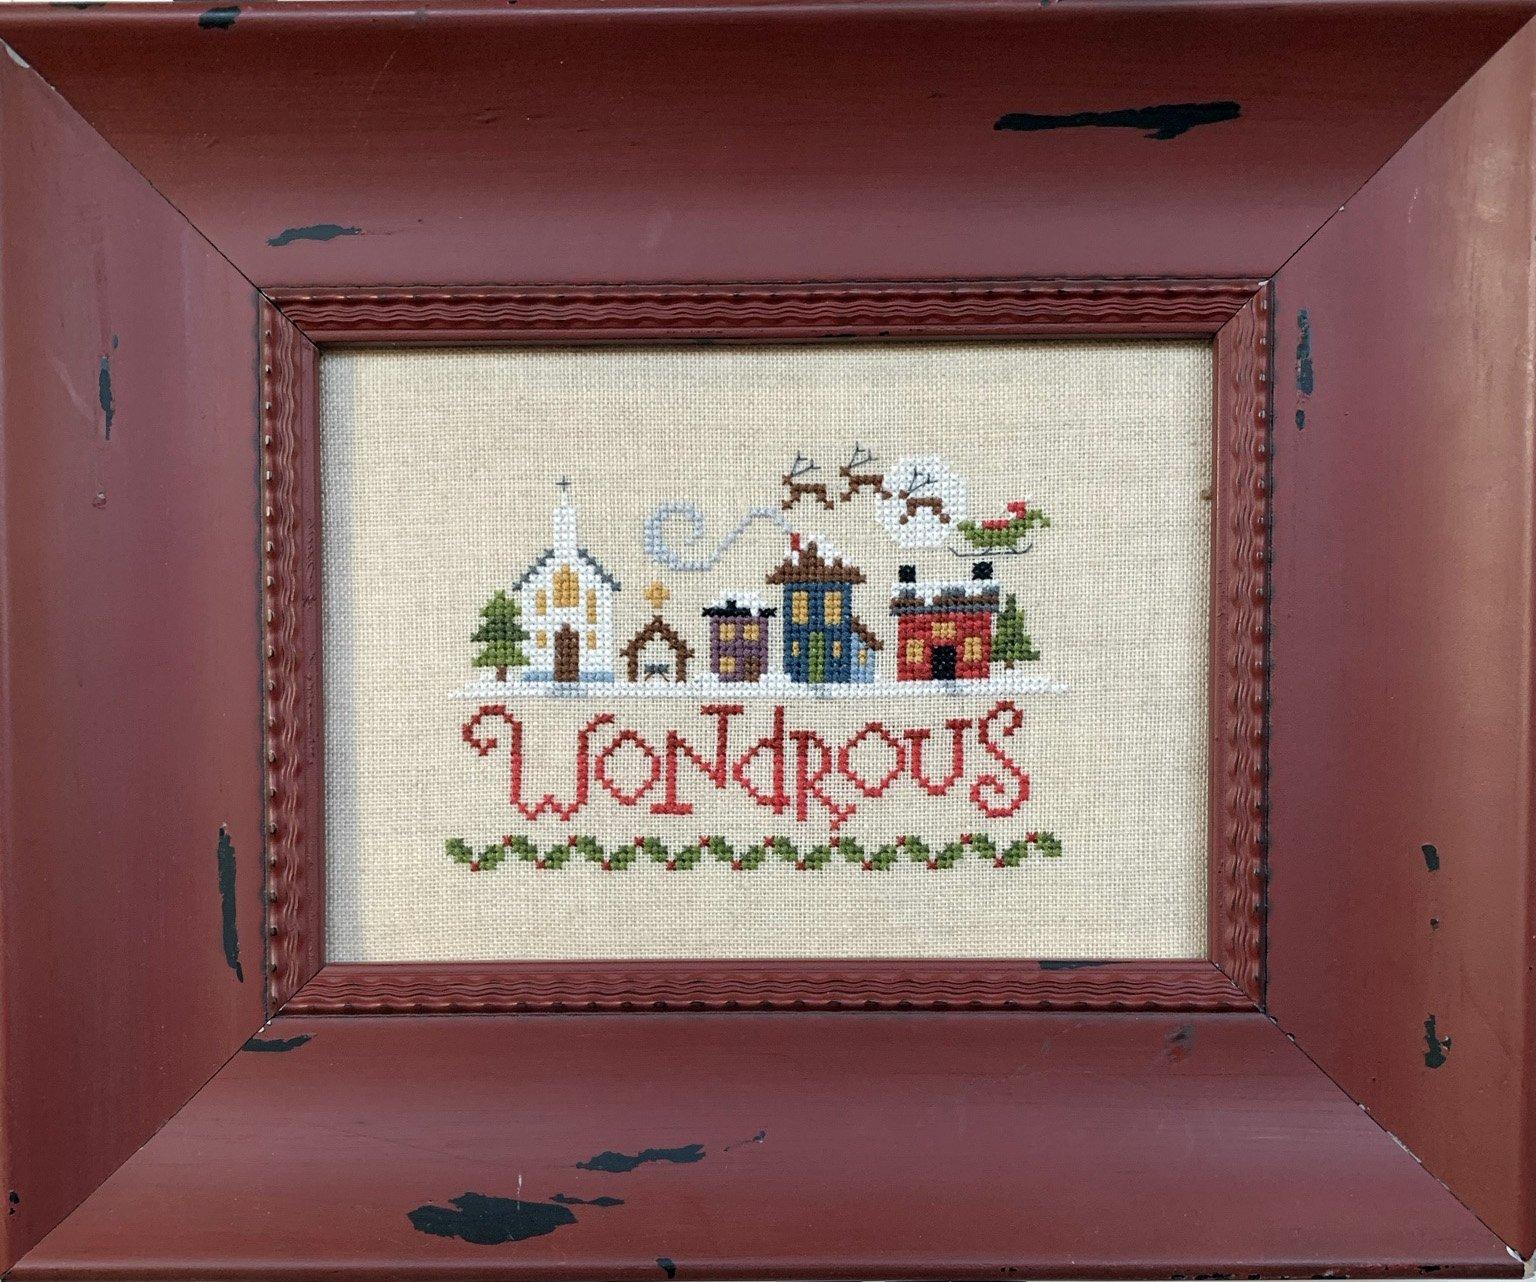 Wondrous - Digital Download Pattern LK11